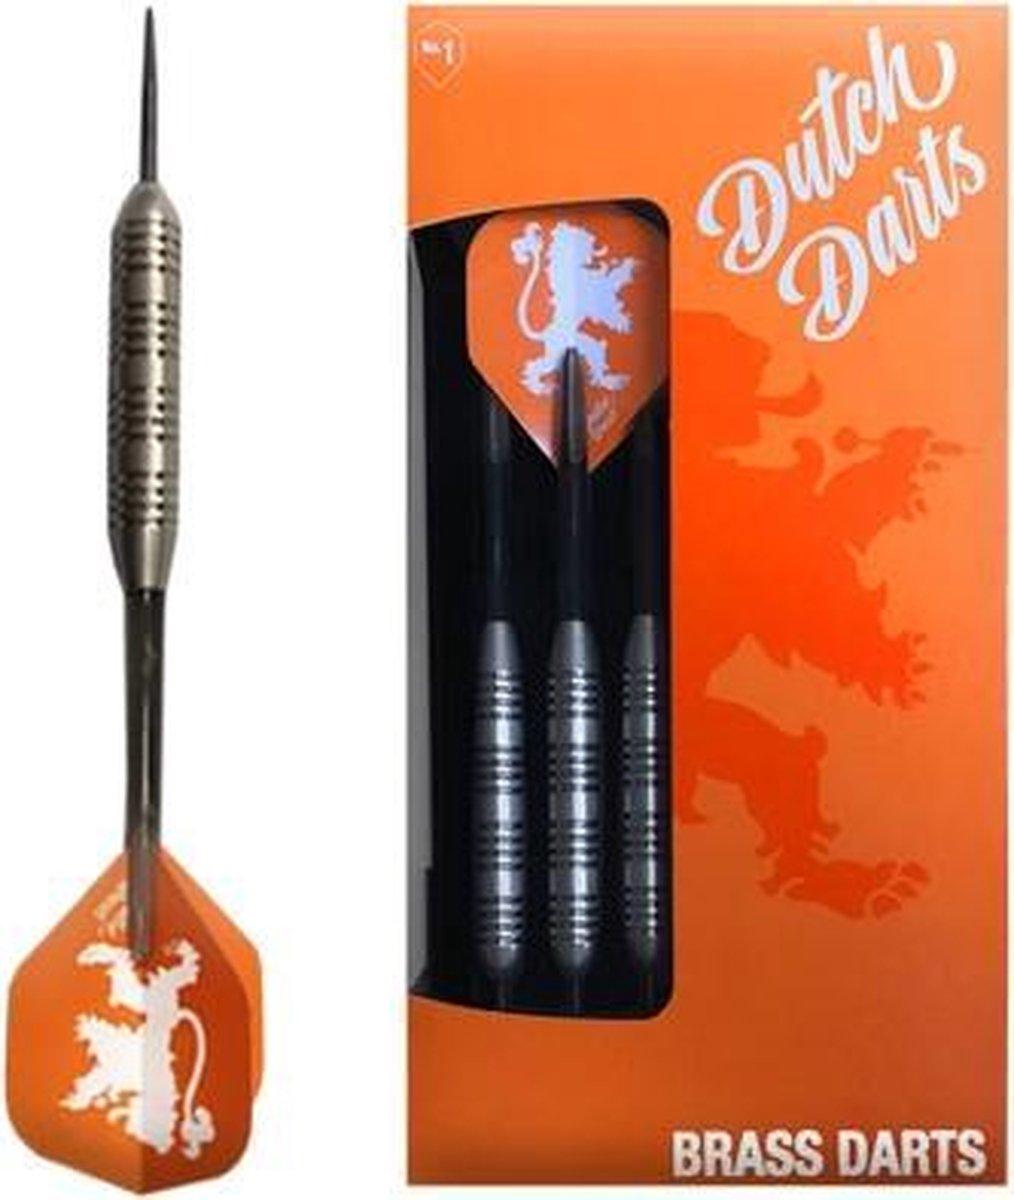 Dutch Darts Nickel Silver 1 - Dartpijl 23 gram - Dutch Darts